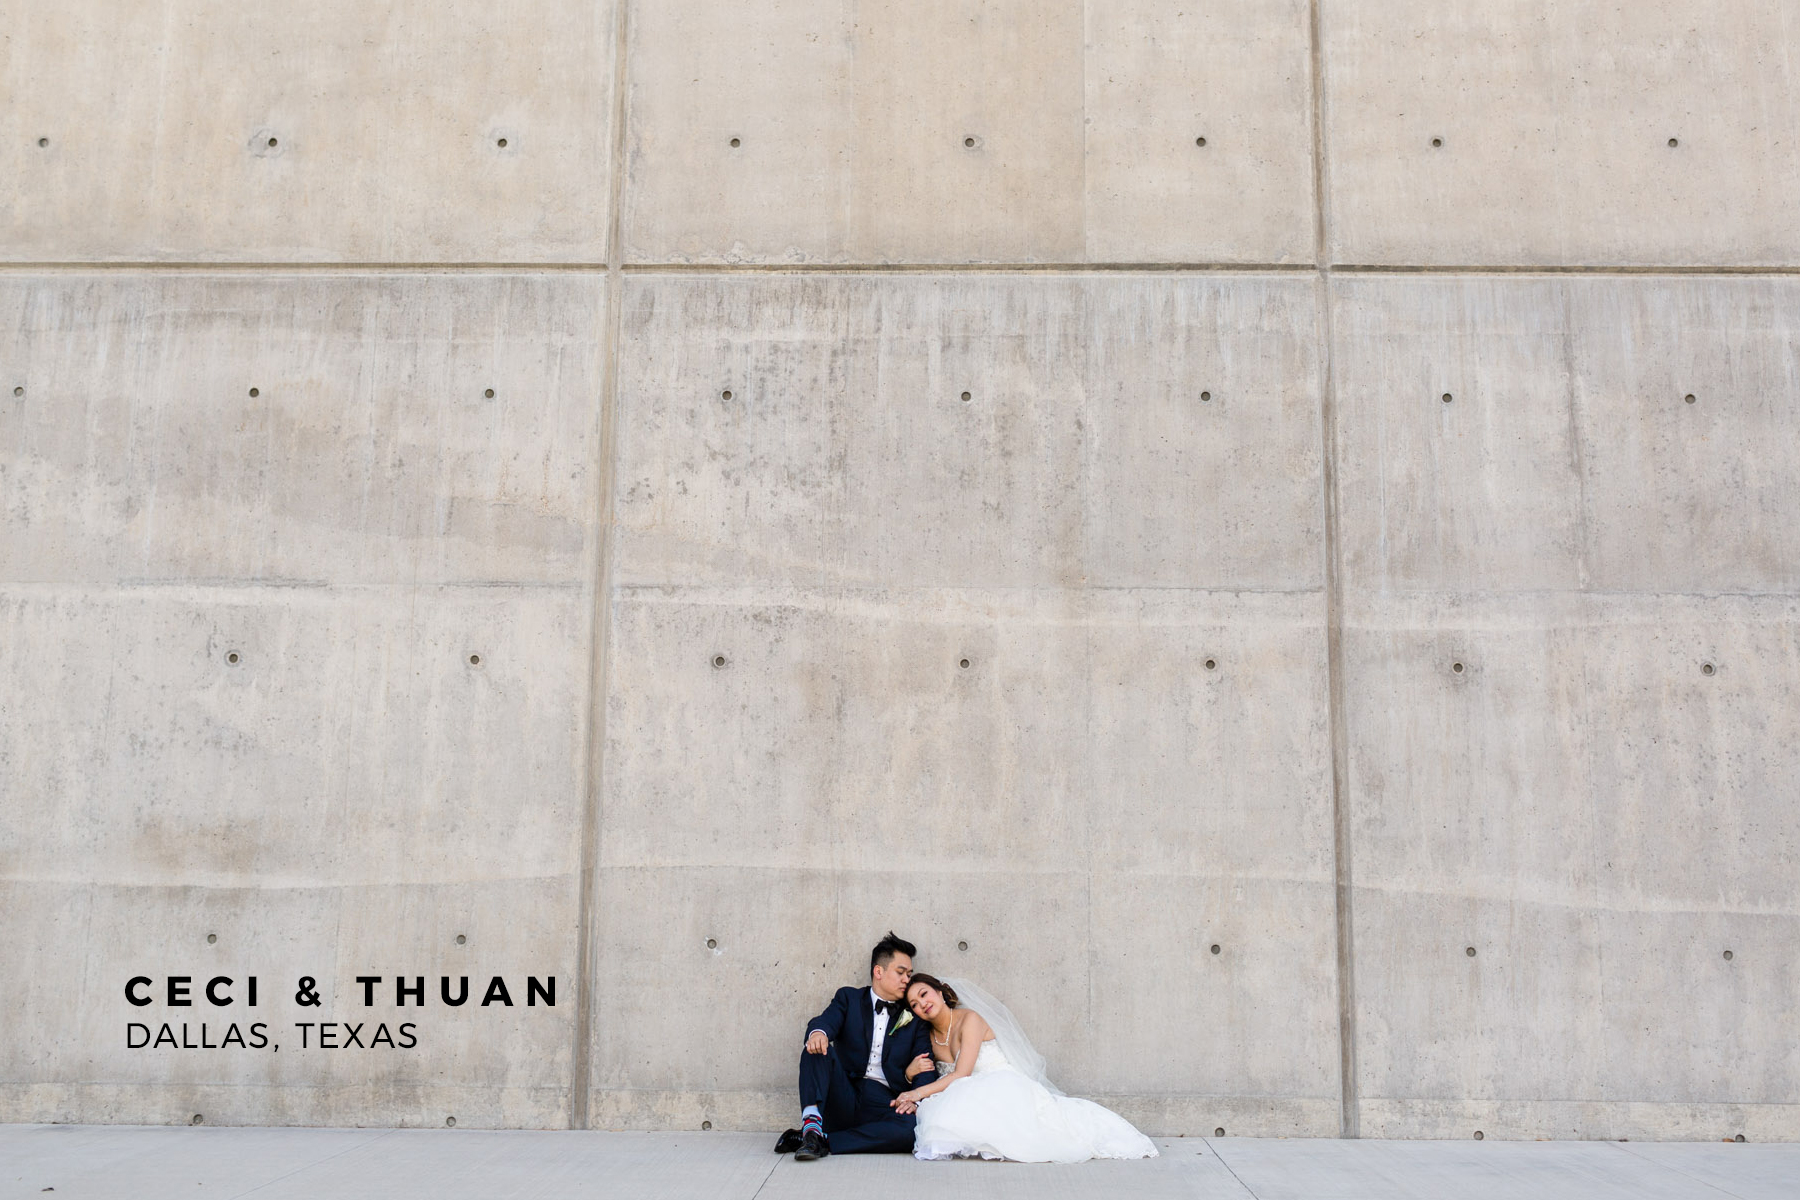 Cecilia and Thuan